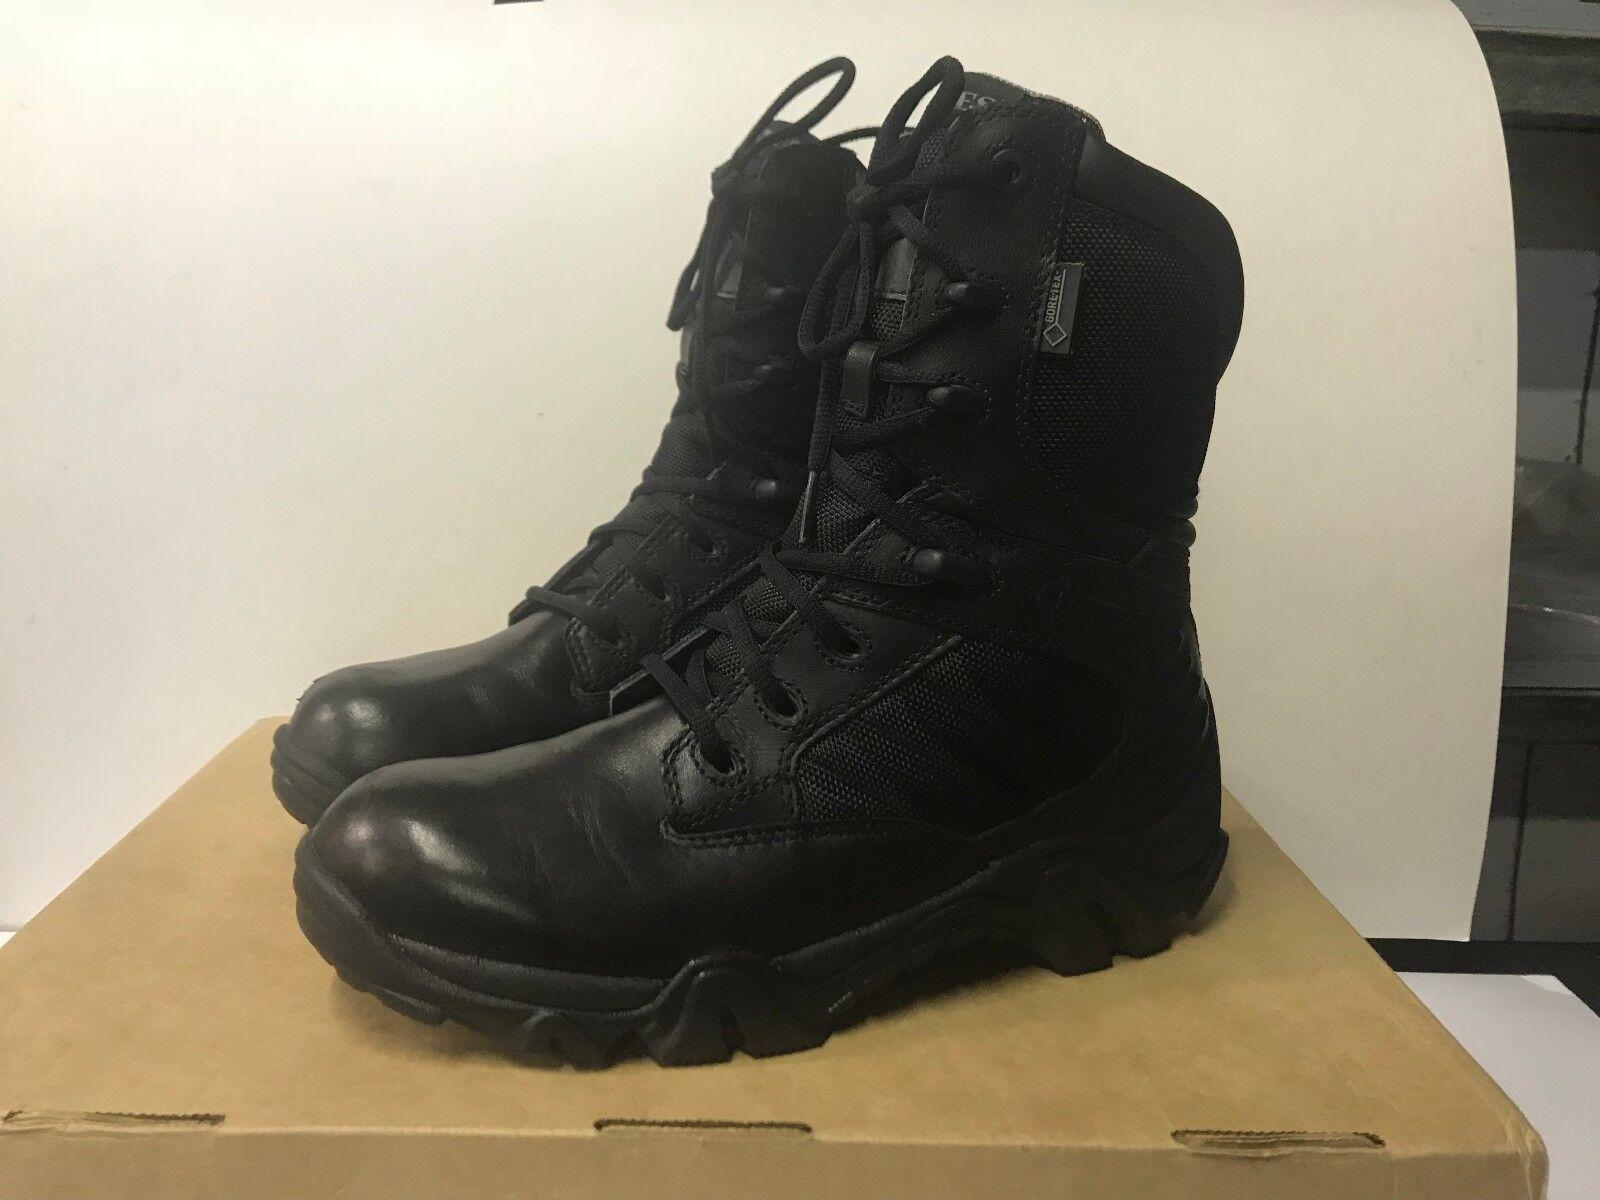 Bates Men's US 7.5 GX-8 8 Inch Ultra-Lites GTX Waterproof Boot 2268 8 Inches